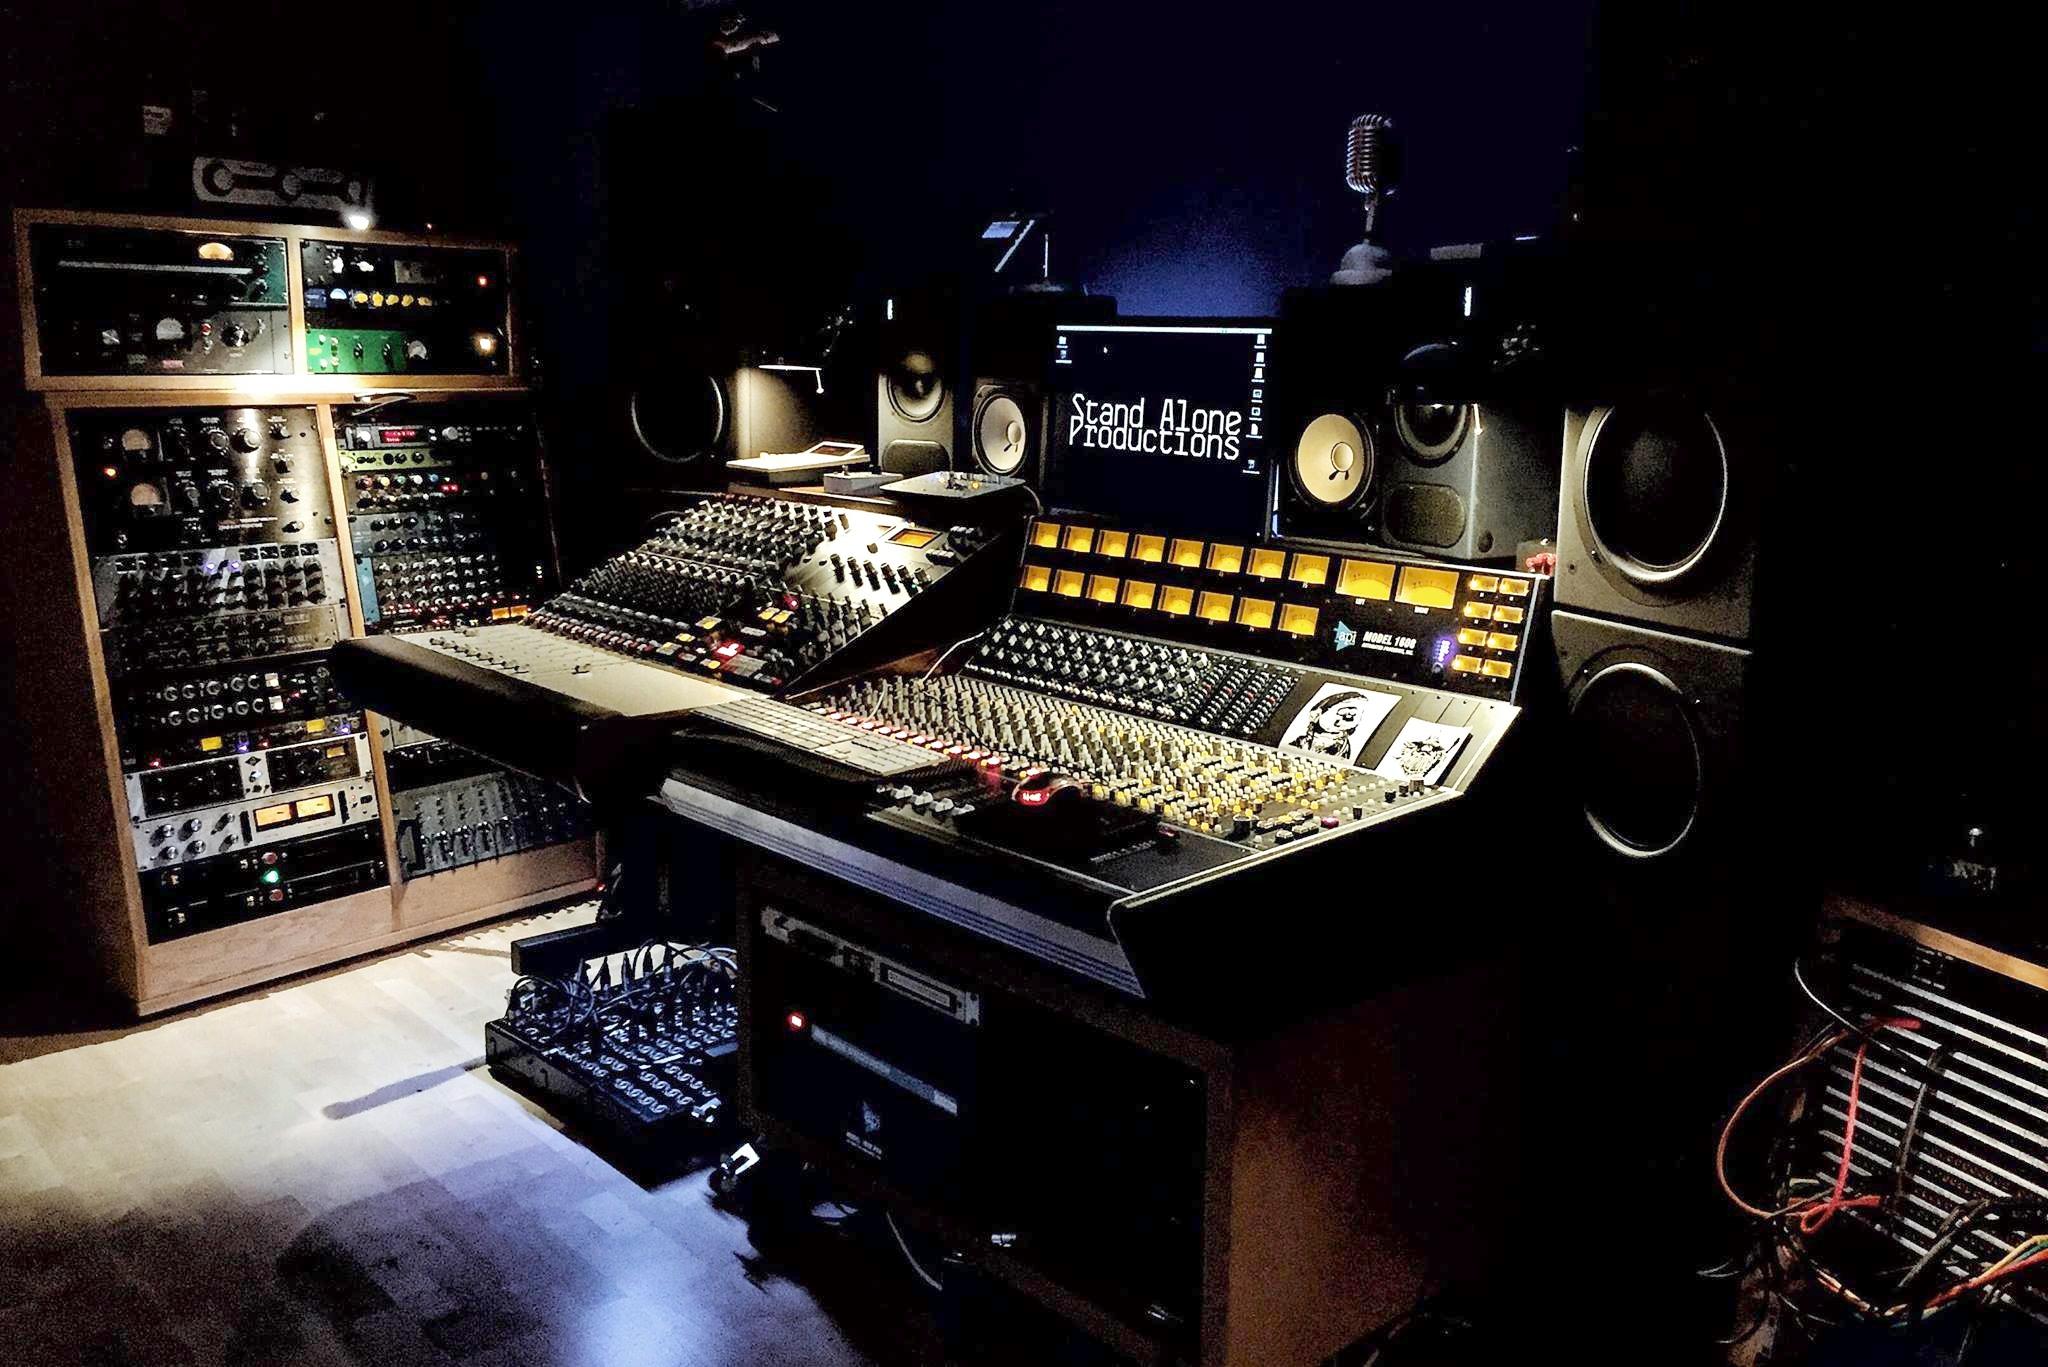 Gareth's amazing studio, Stand Alone Production.